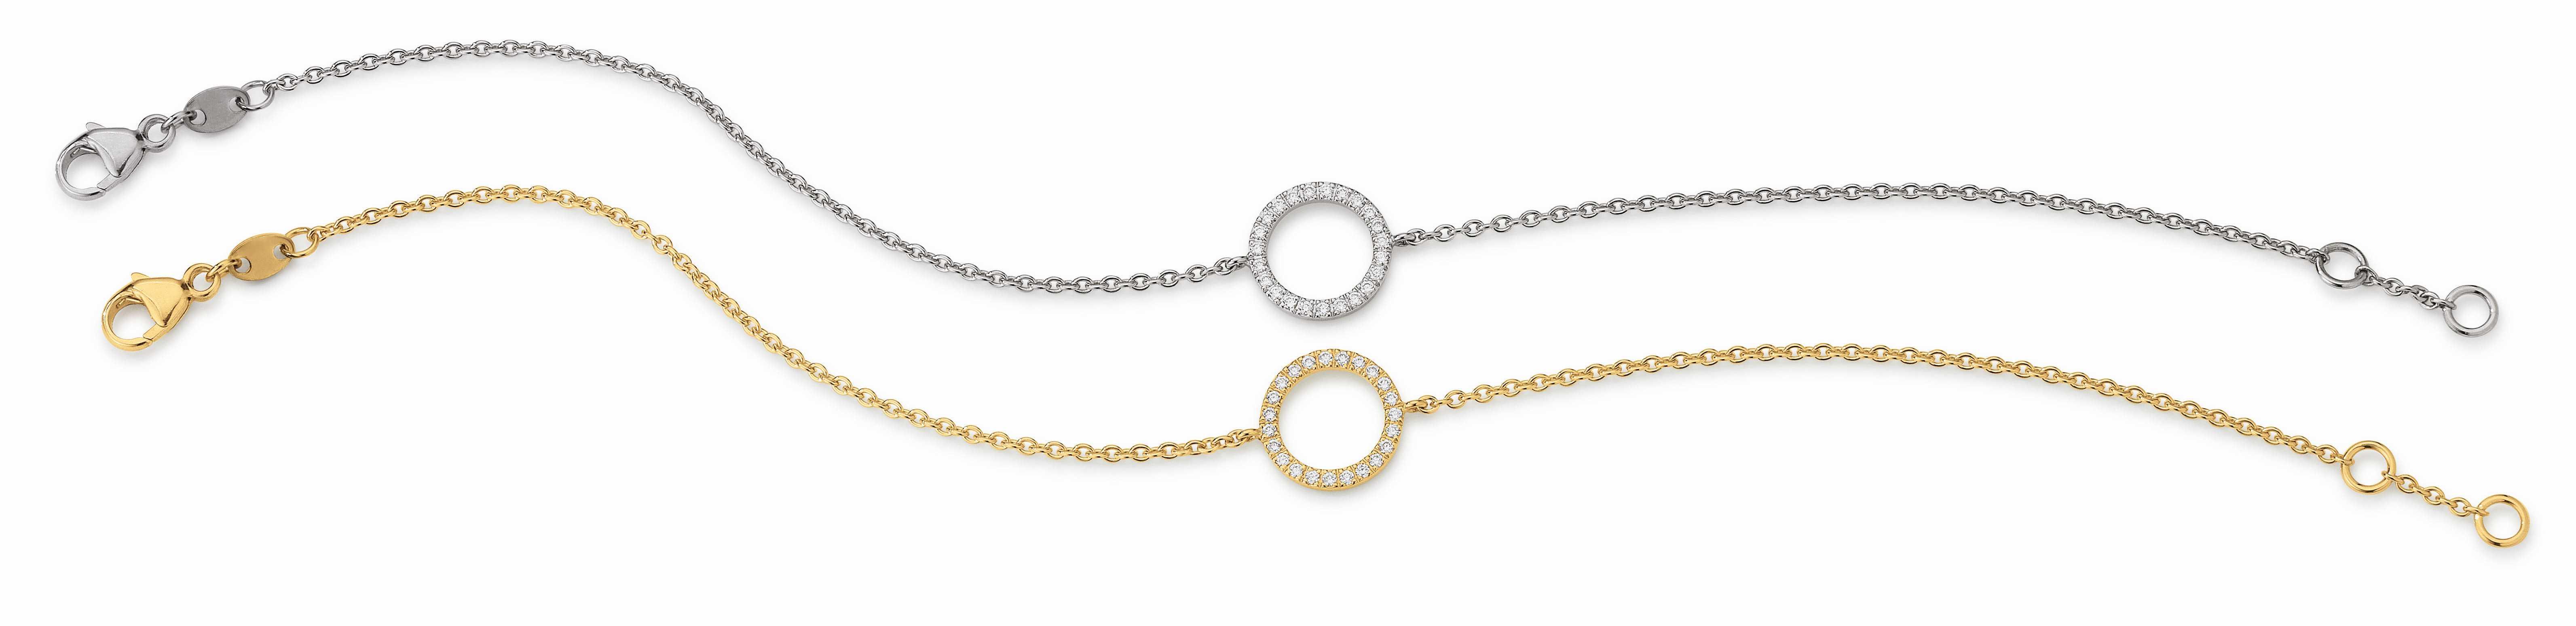 sparkling-rings-in-autumn-armband-gold-weißgold-brillanten